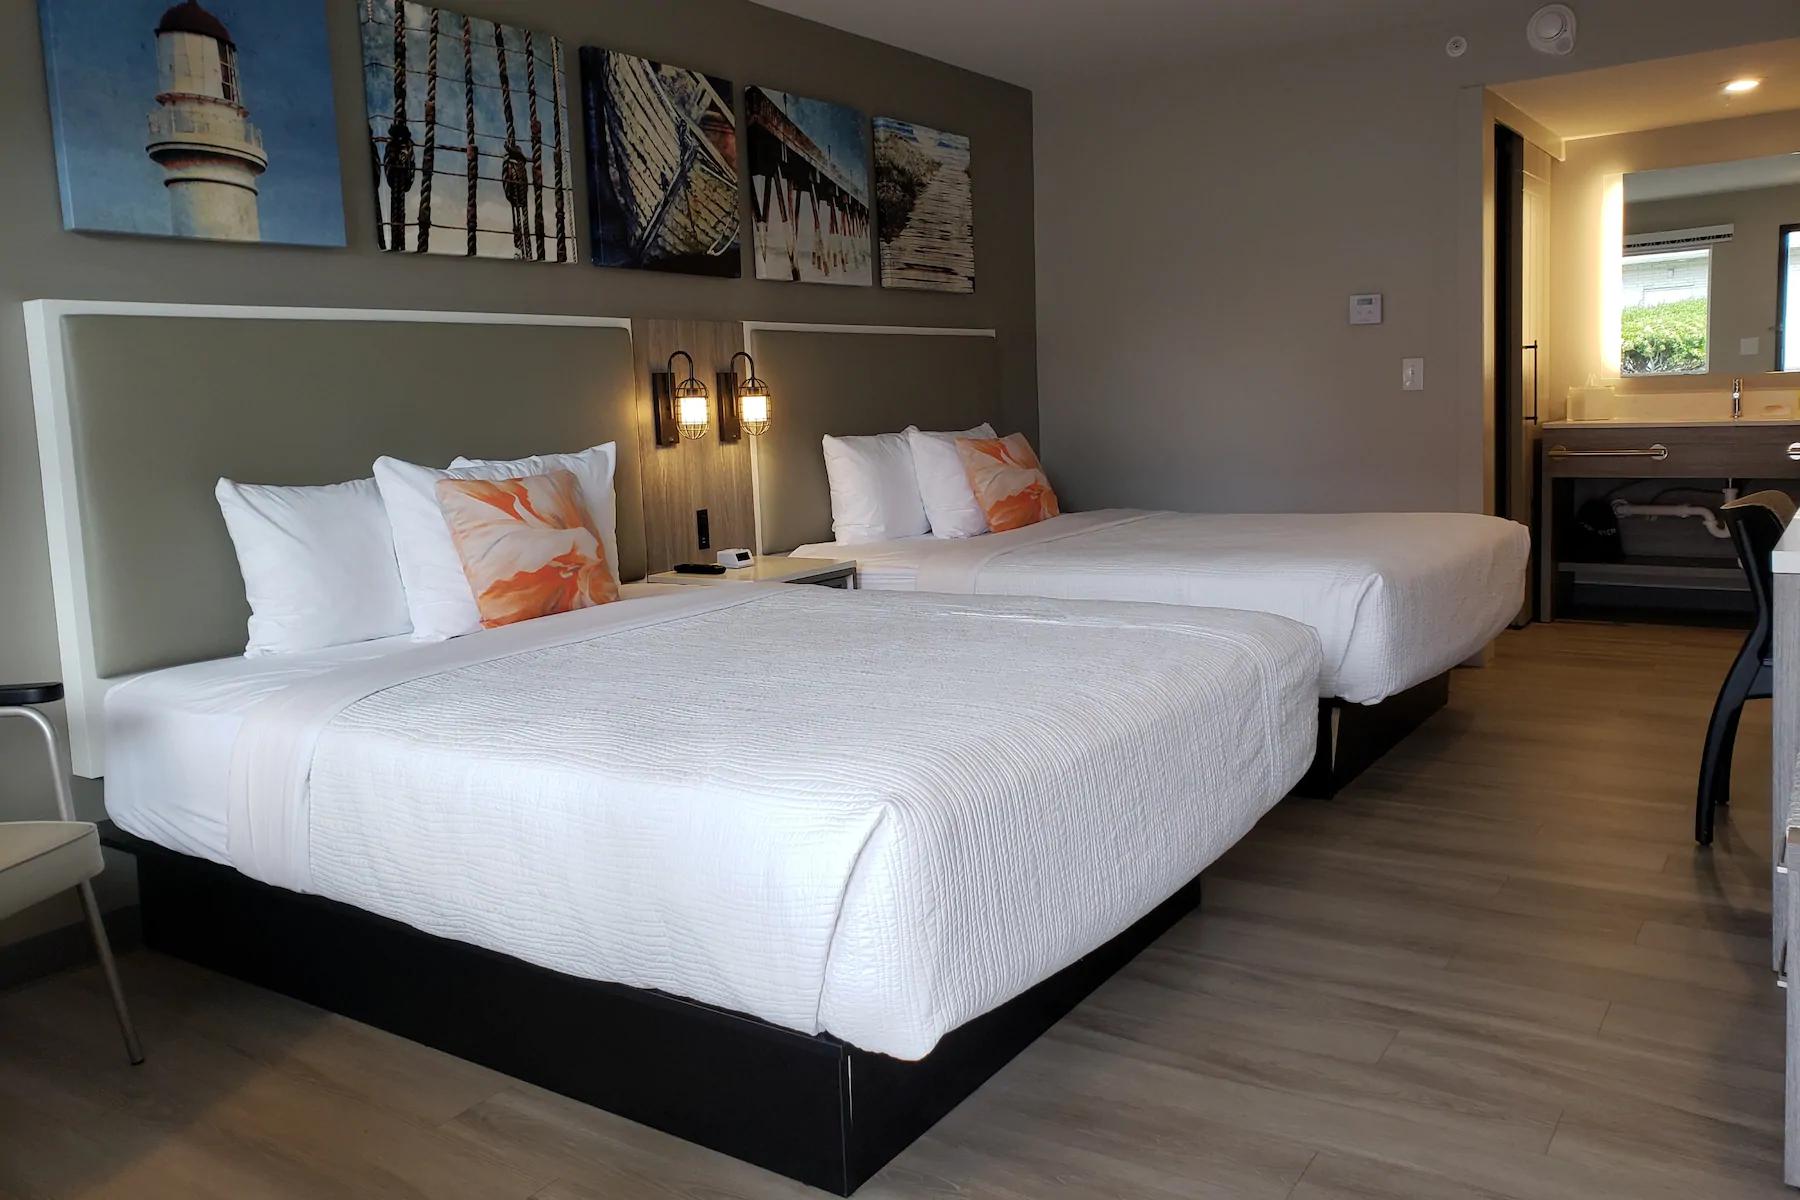 Days Inn by Wyndham Wilmington / University hotel